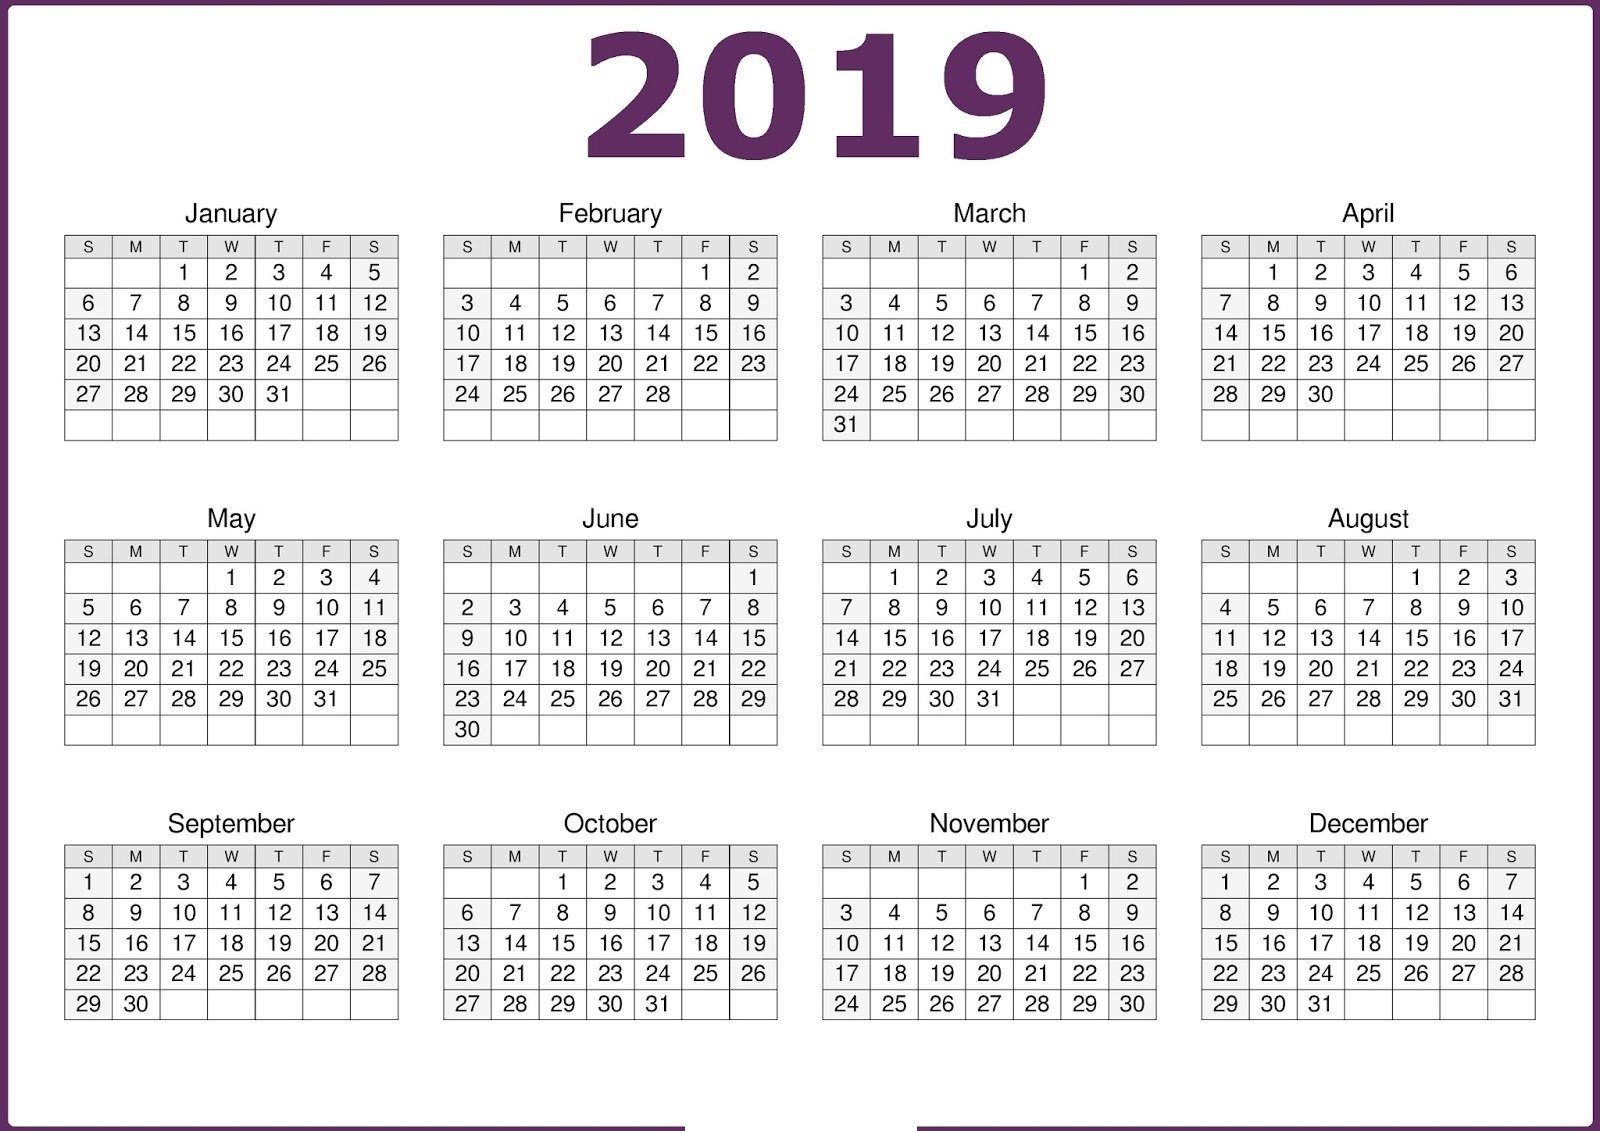 Calendar 2019 Pdf (1)   Download 2019 Calendar Printable With Calendar 2019 Pdf Free Download